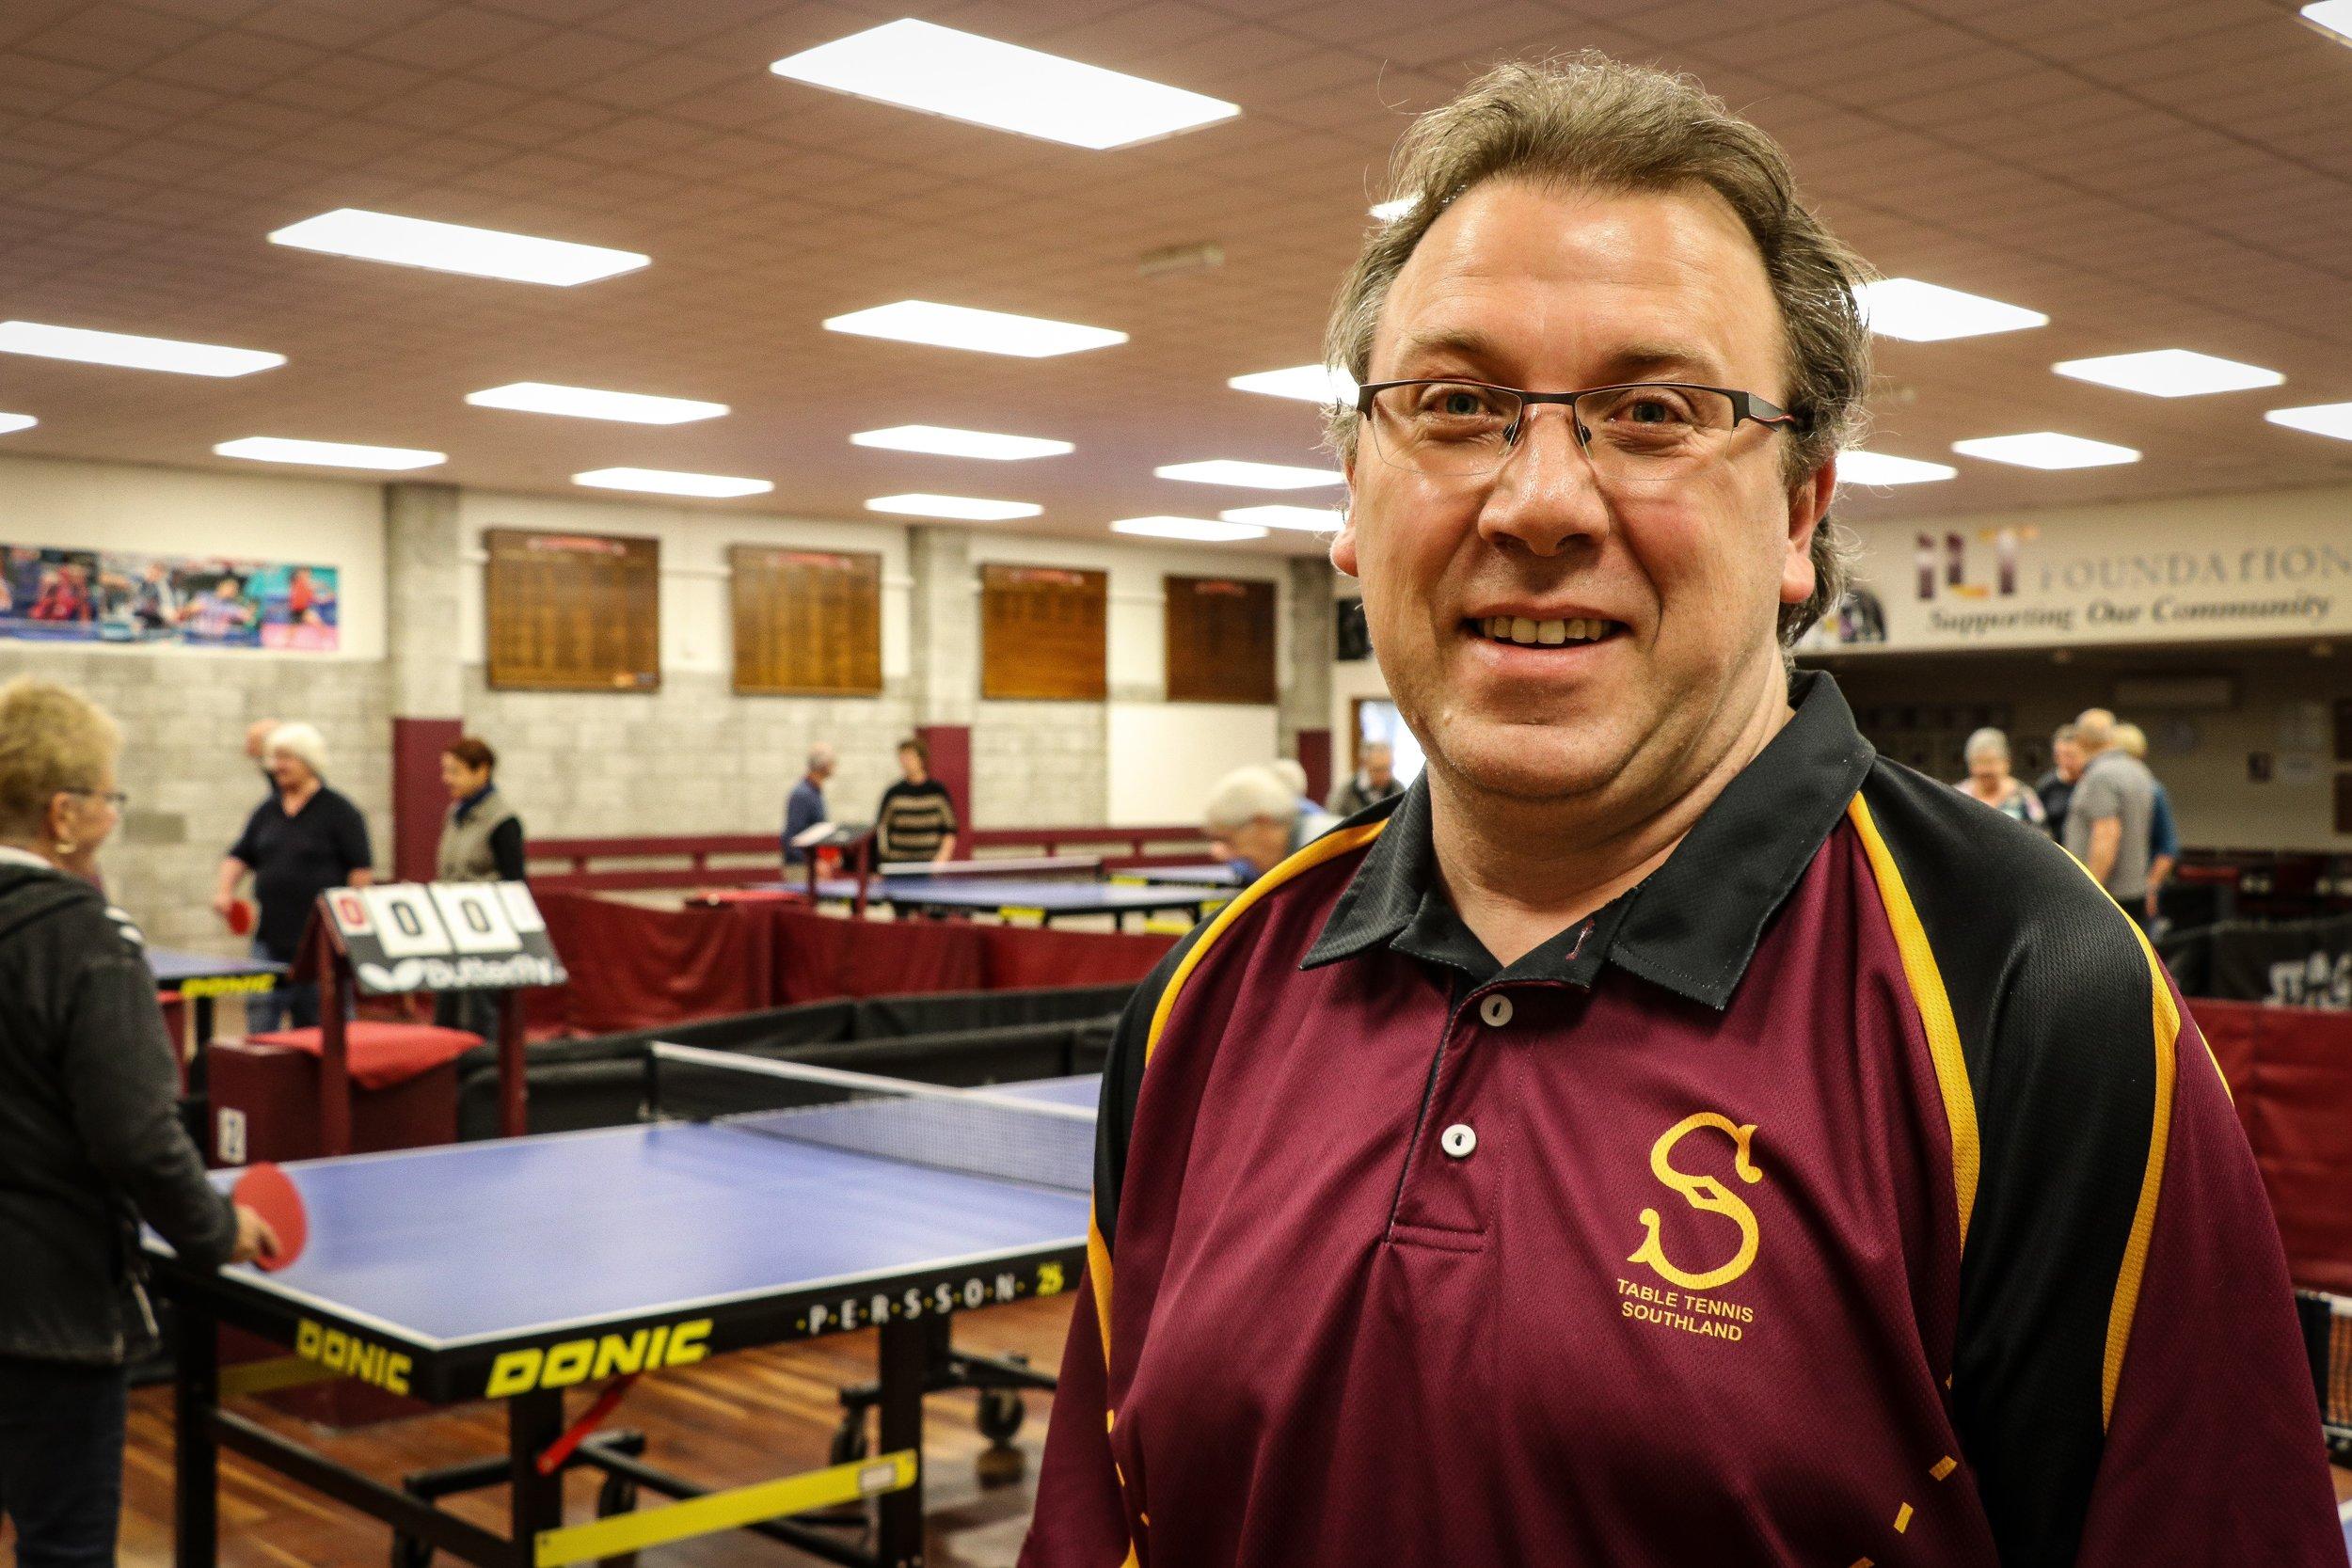 Photo: Tennis Southland operations manager Wayne McEwan. Pic: Nathan Burdon